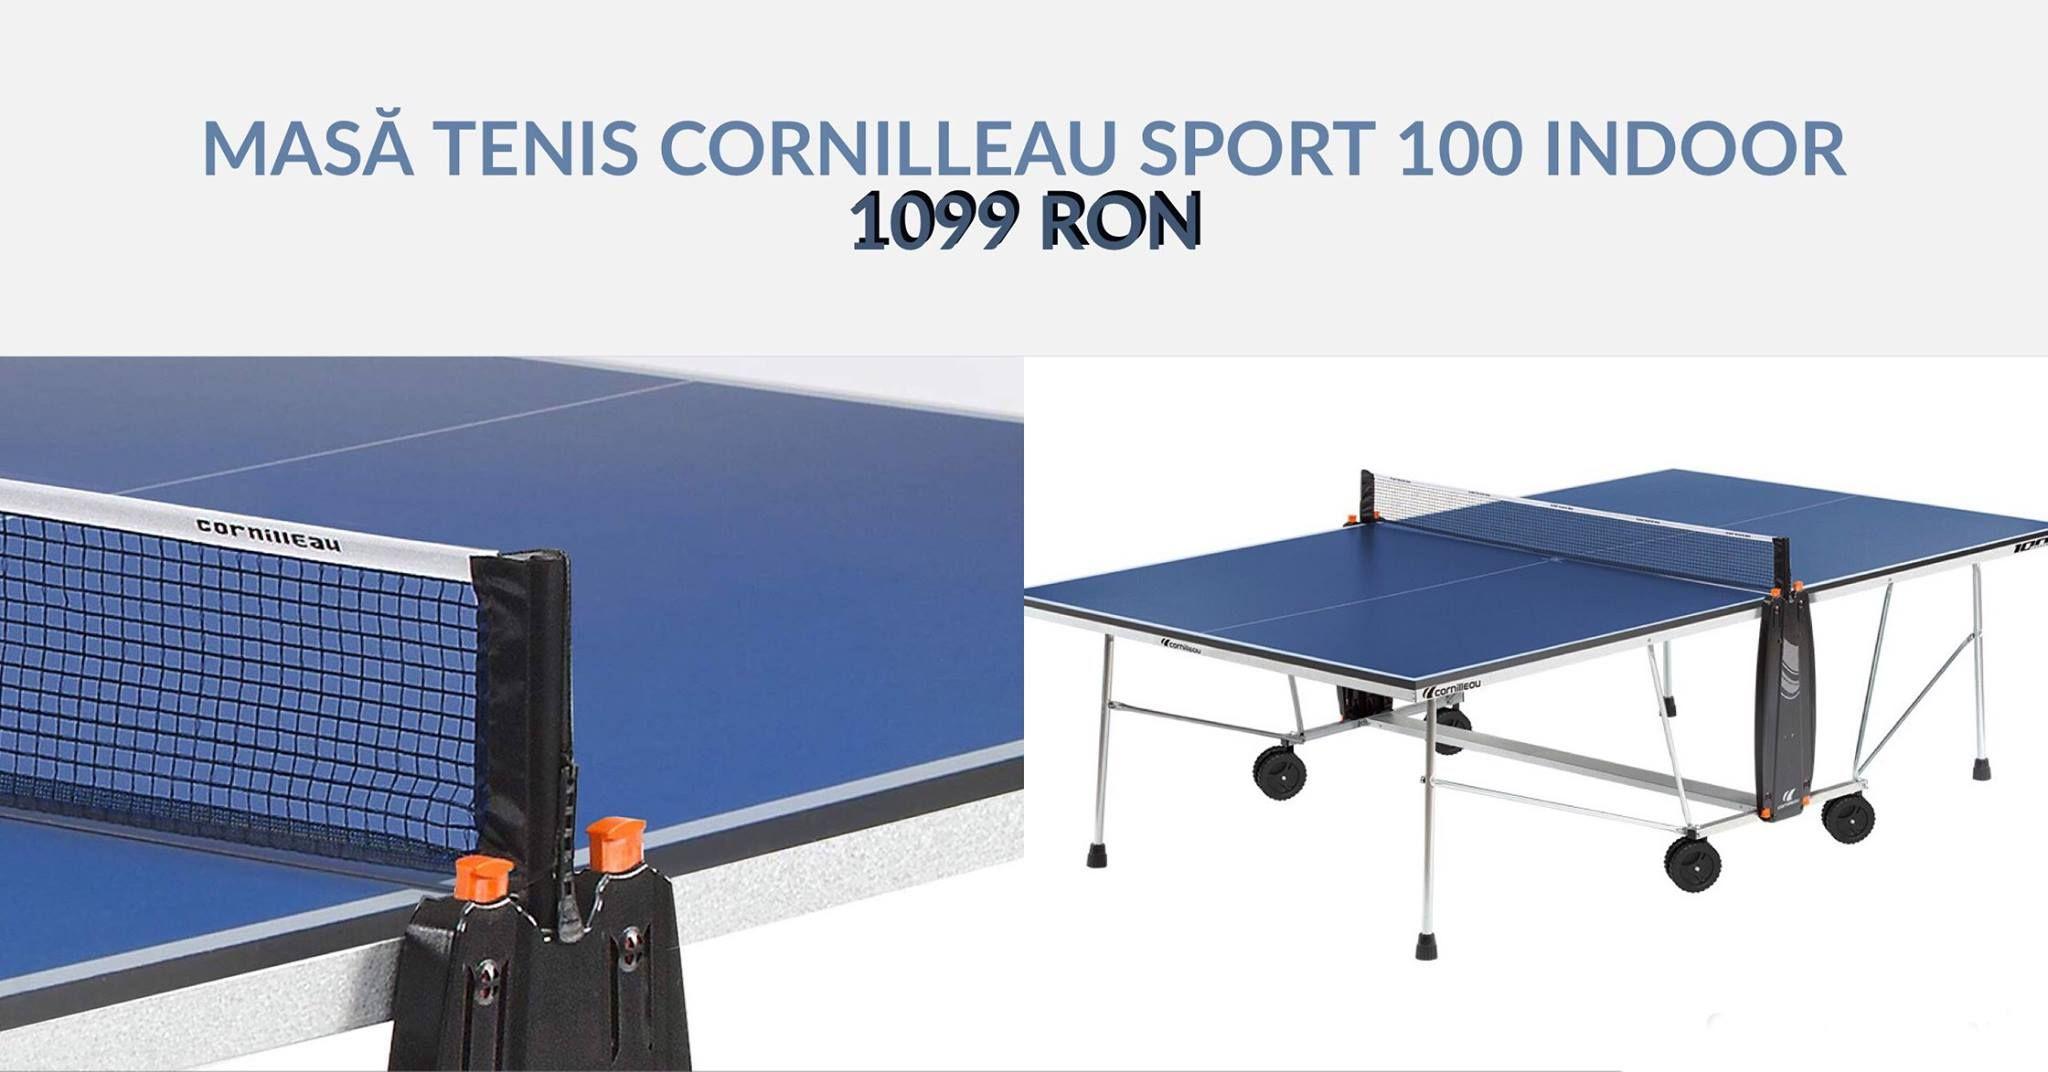 masa tenis cornilleau sport 100 indoor discount 15 mese tenis